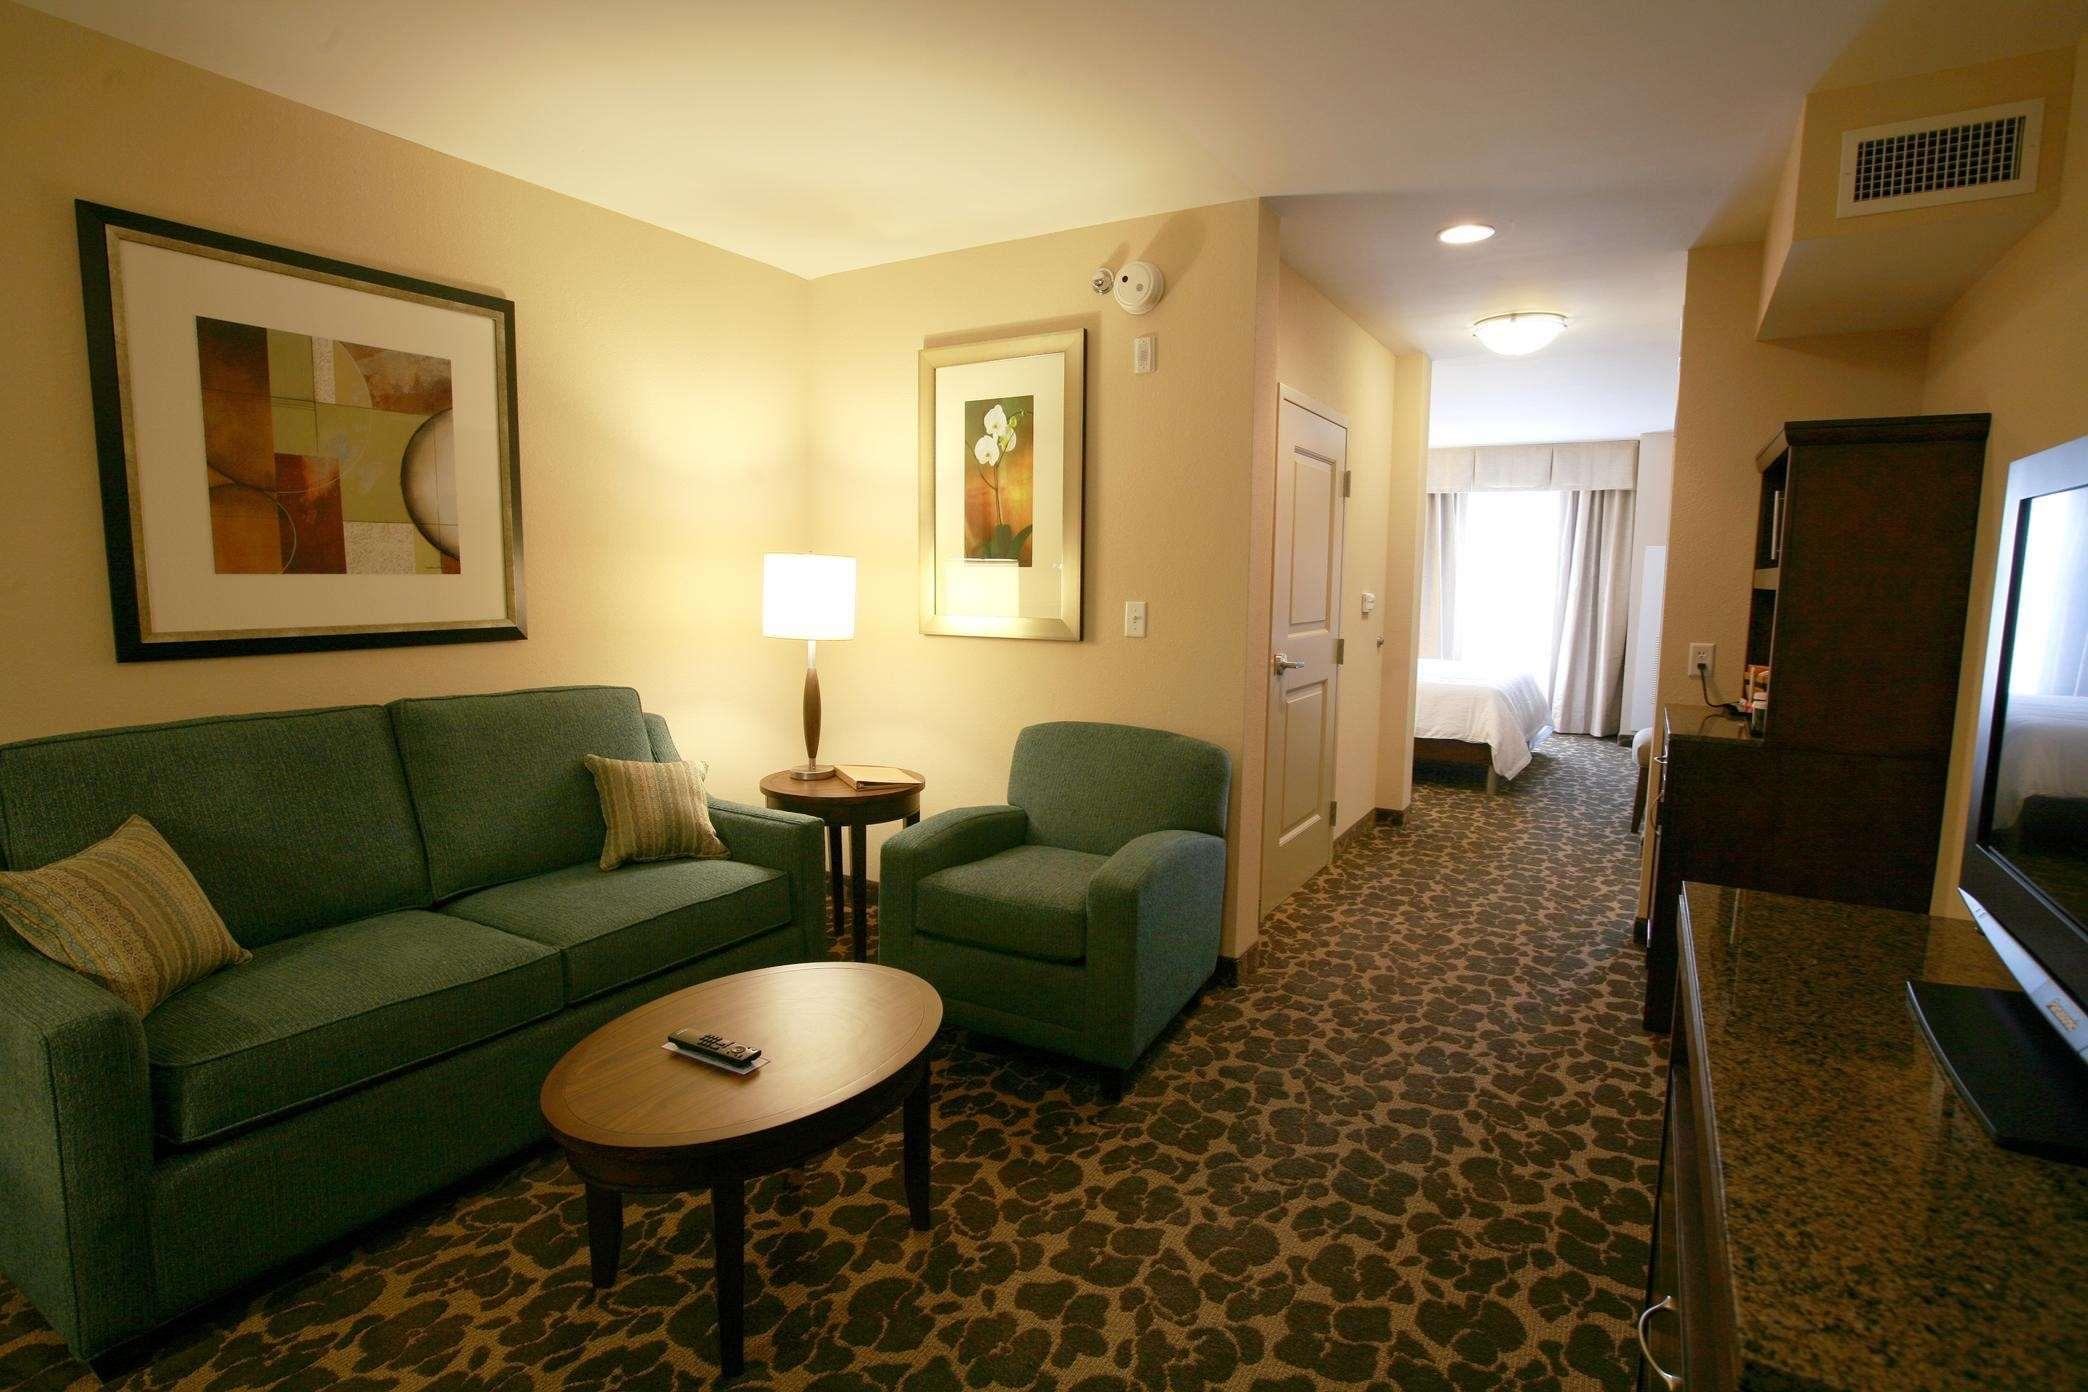 Hilton Garden Inn Charlotte/Concord image 12